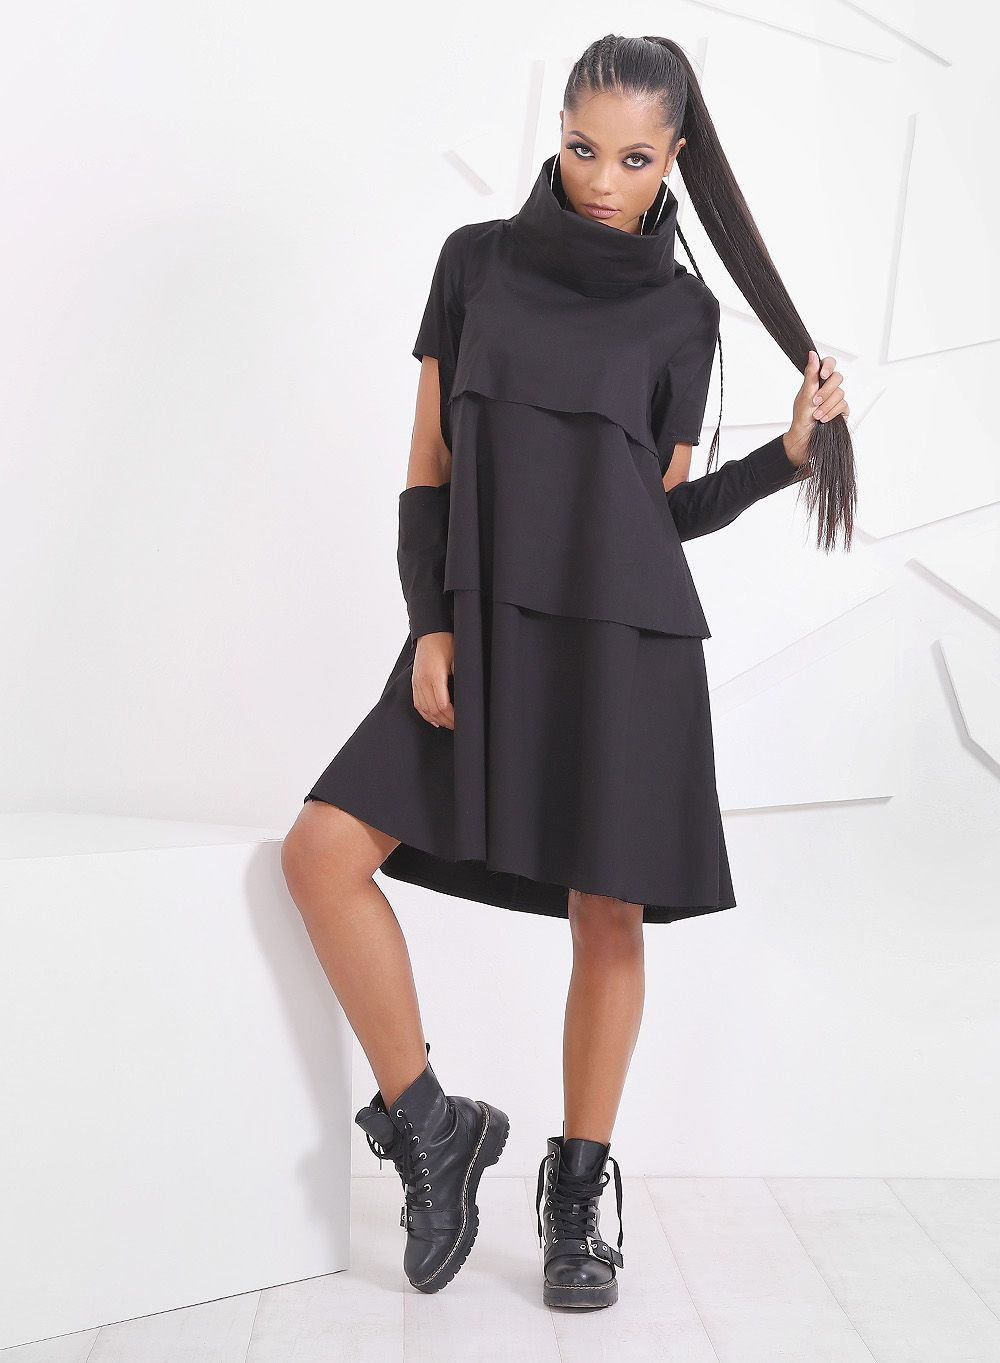 Extravagant Turtleneck Dress/ Loose Dress/ Black Dress/ Midi Dress ...